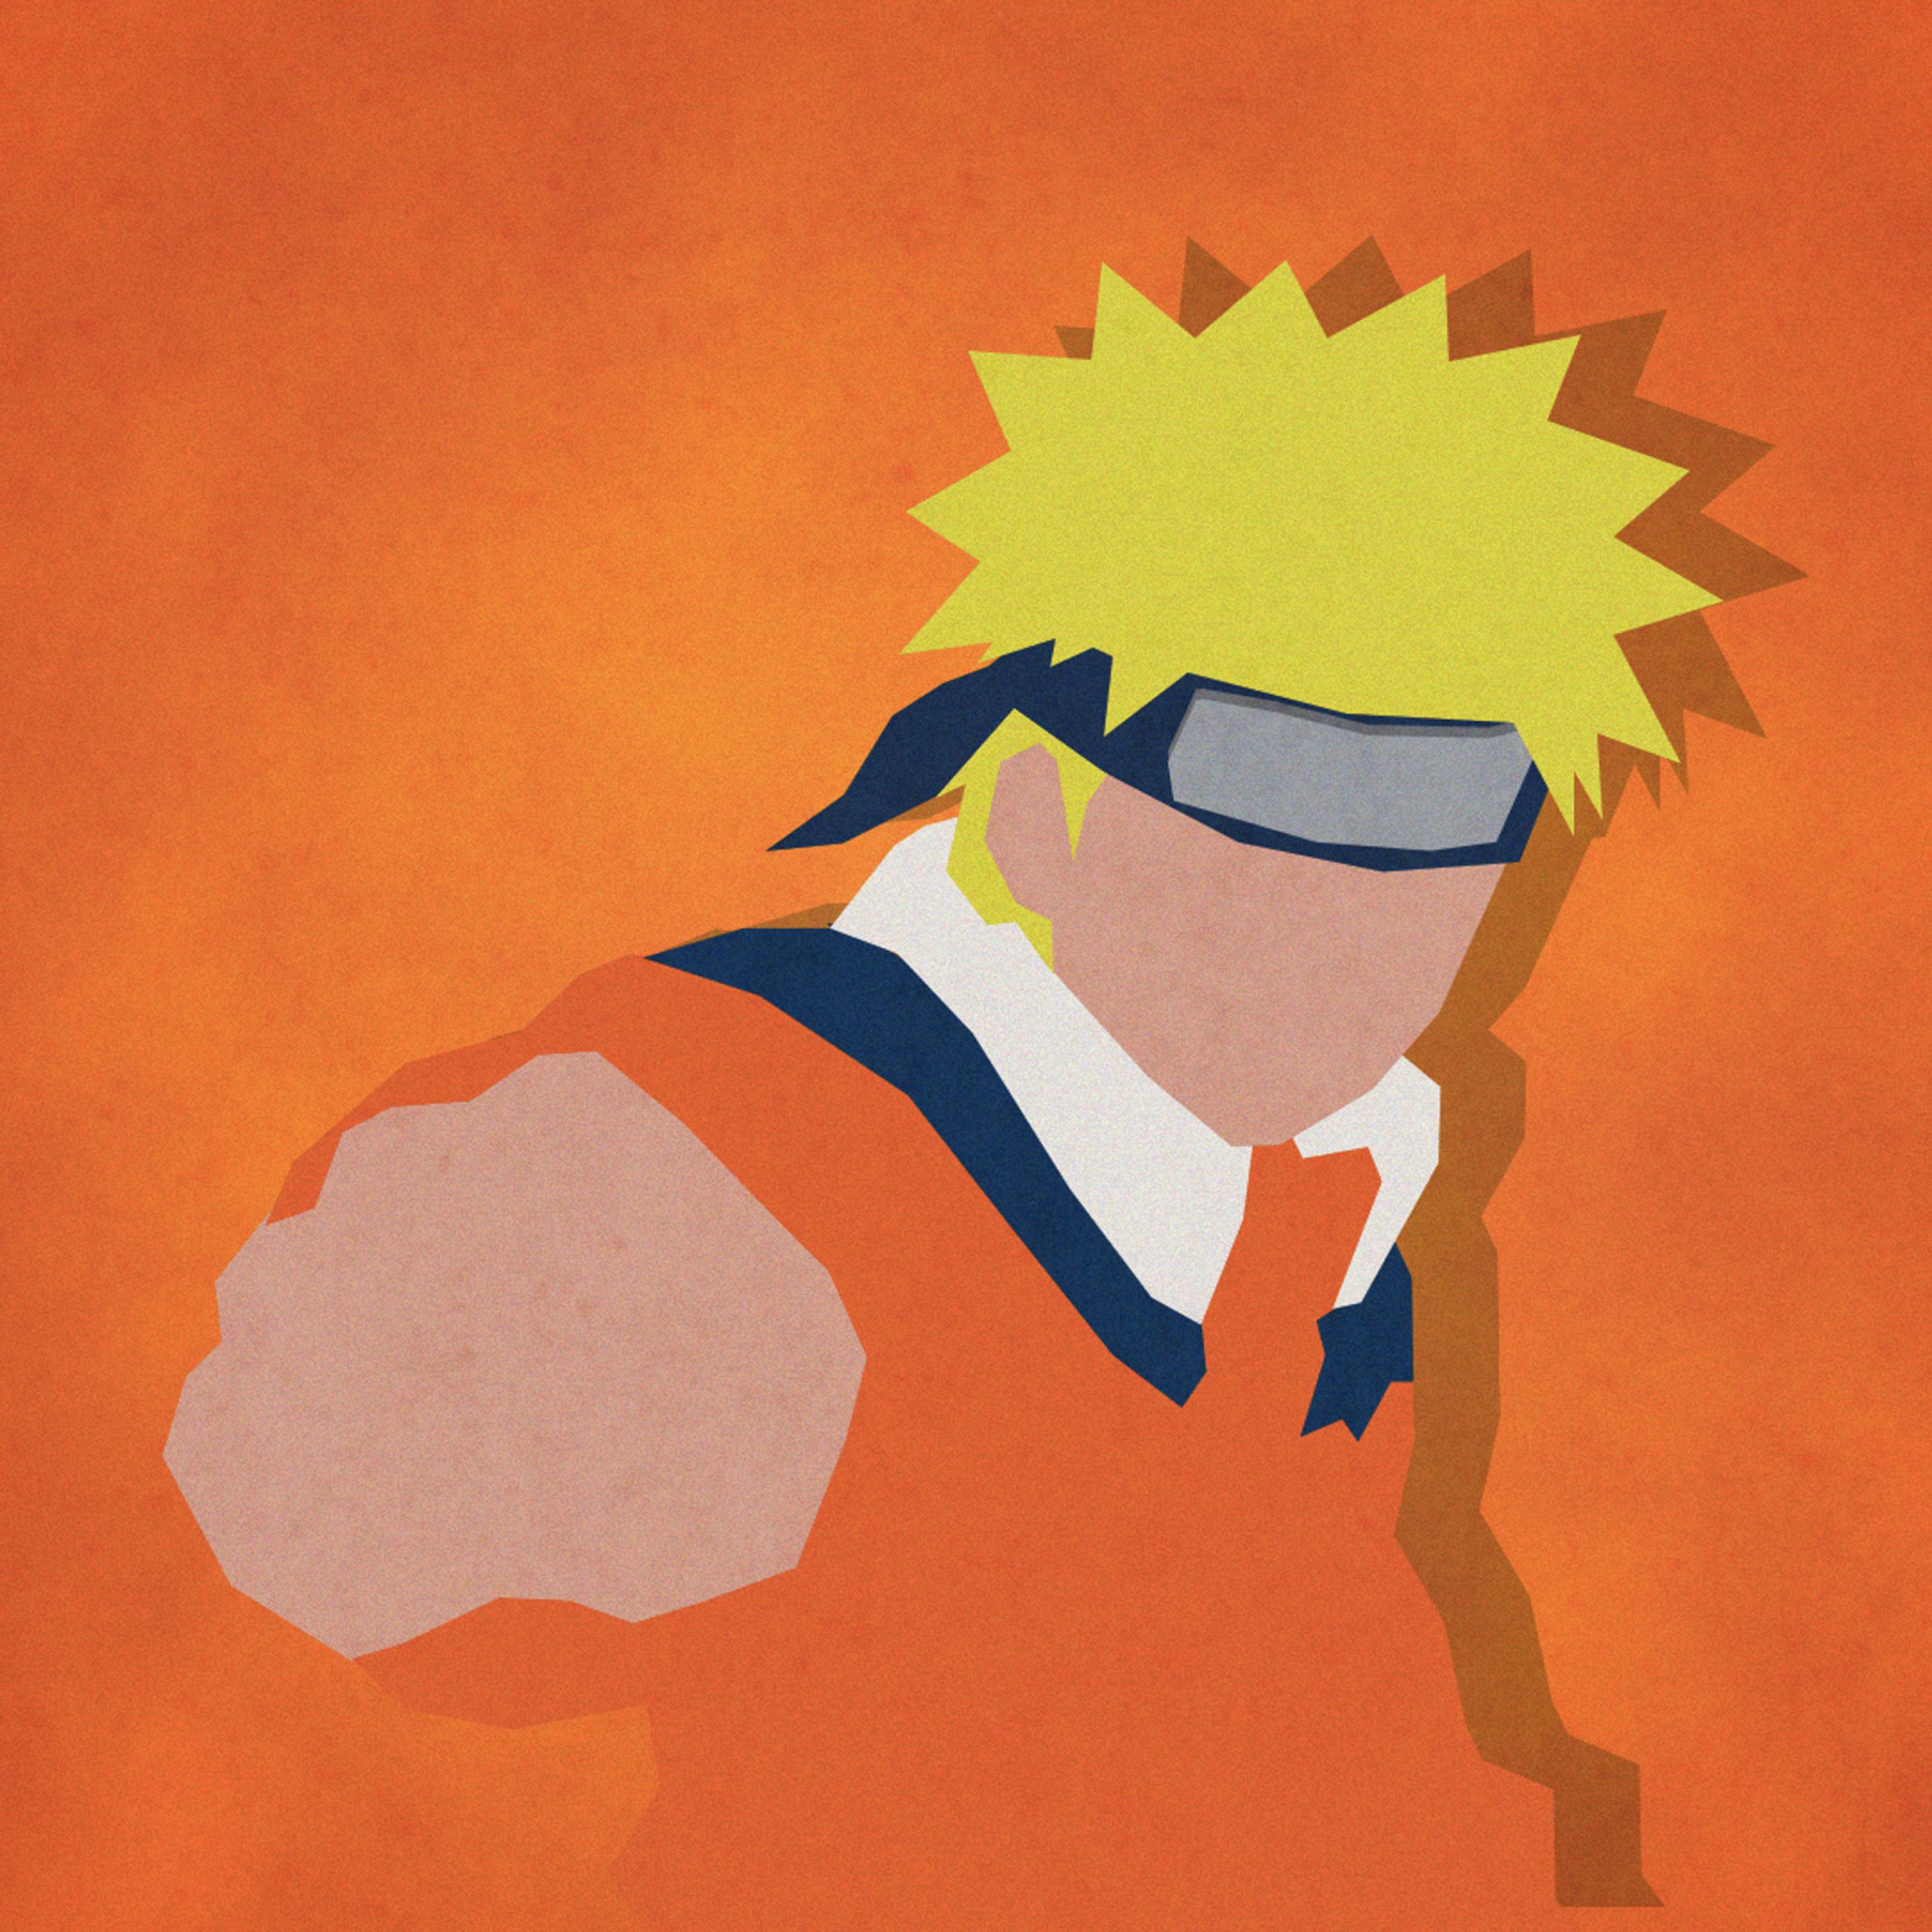 Uzumaki Naruto Shippuuden Minimalism, HD 4K Wallpaper